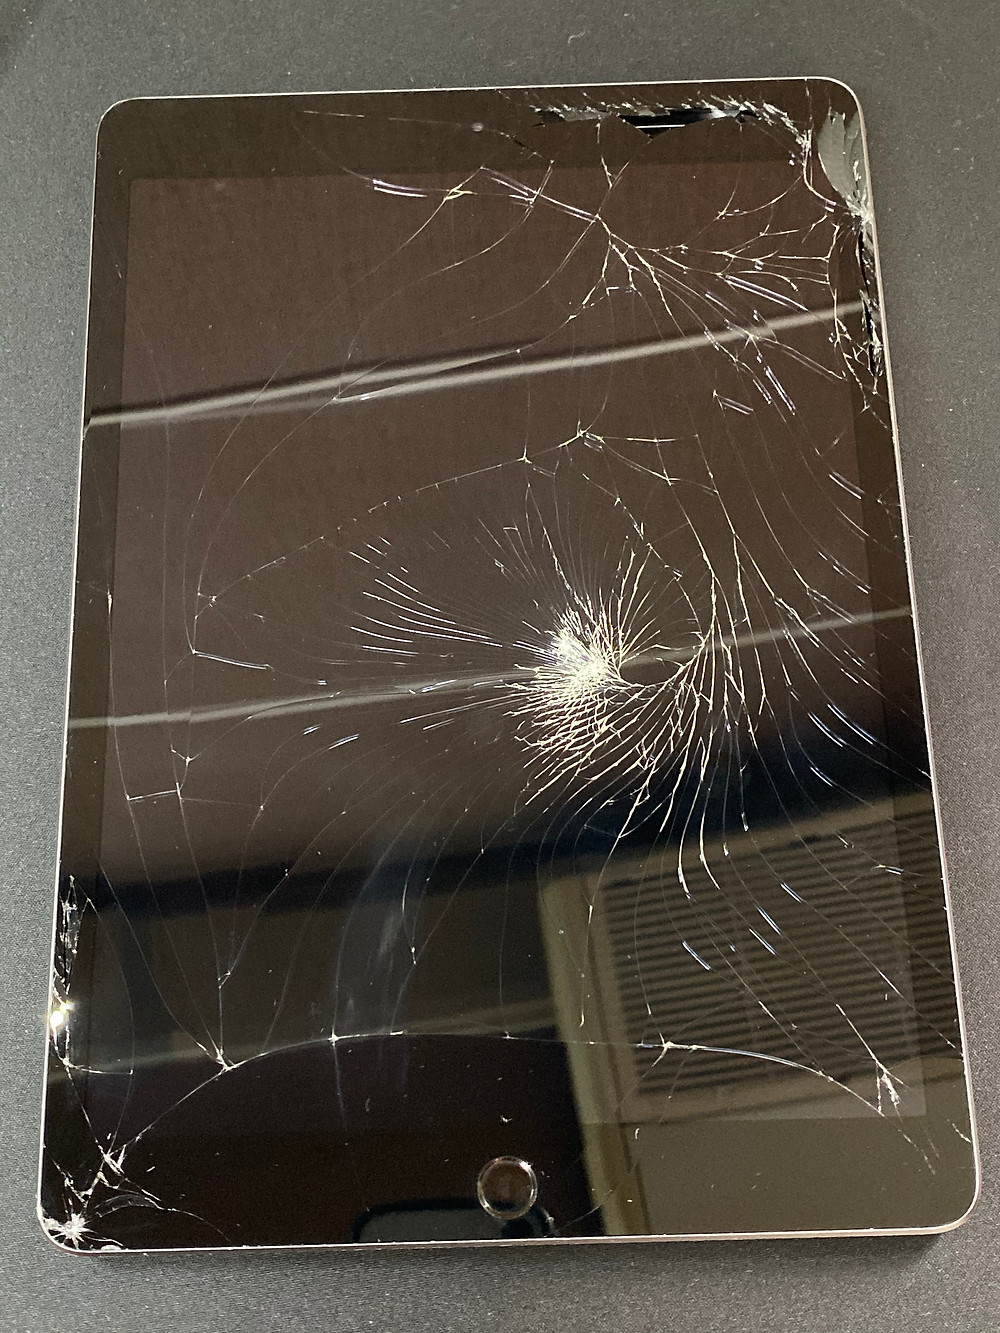 iPadのガラス割れは放置すると危険!《iPhone修理 パソコン修理 高岡》